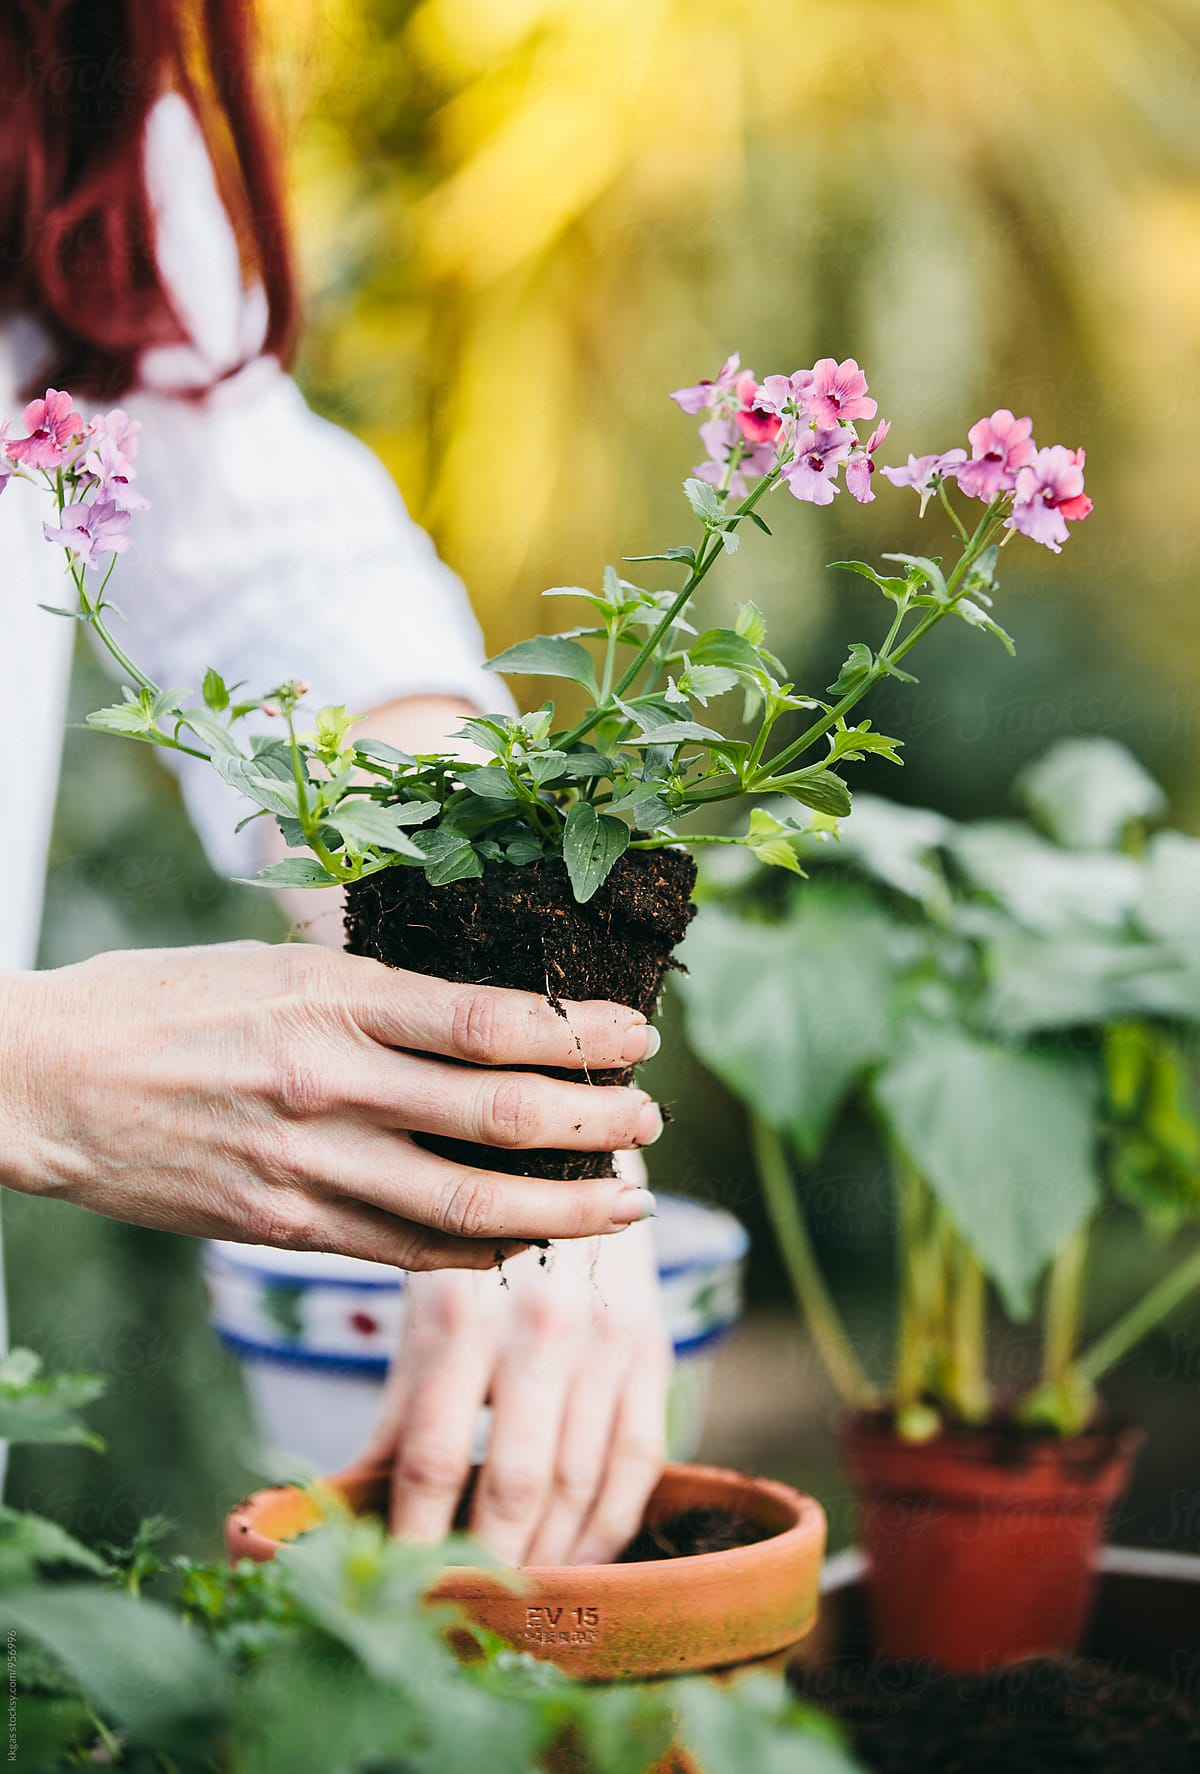 Woman planting spring flowers into terracotta pots stocksy united woman planting spring flowers into terracotta pots by kkgas for stocksy united mightylinksfo